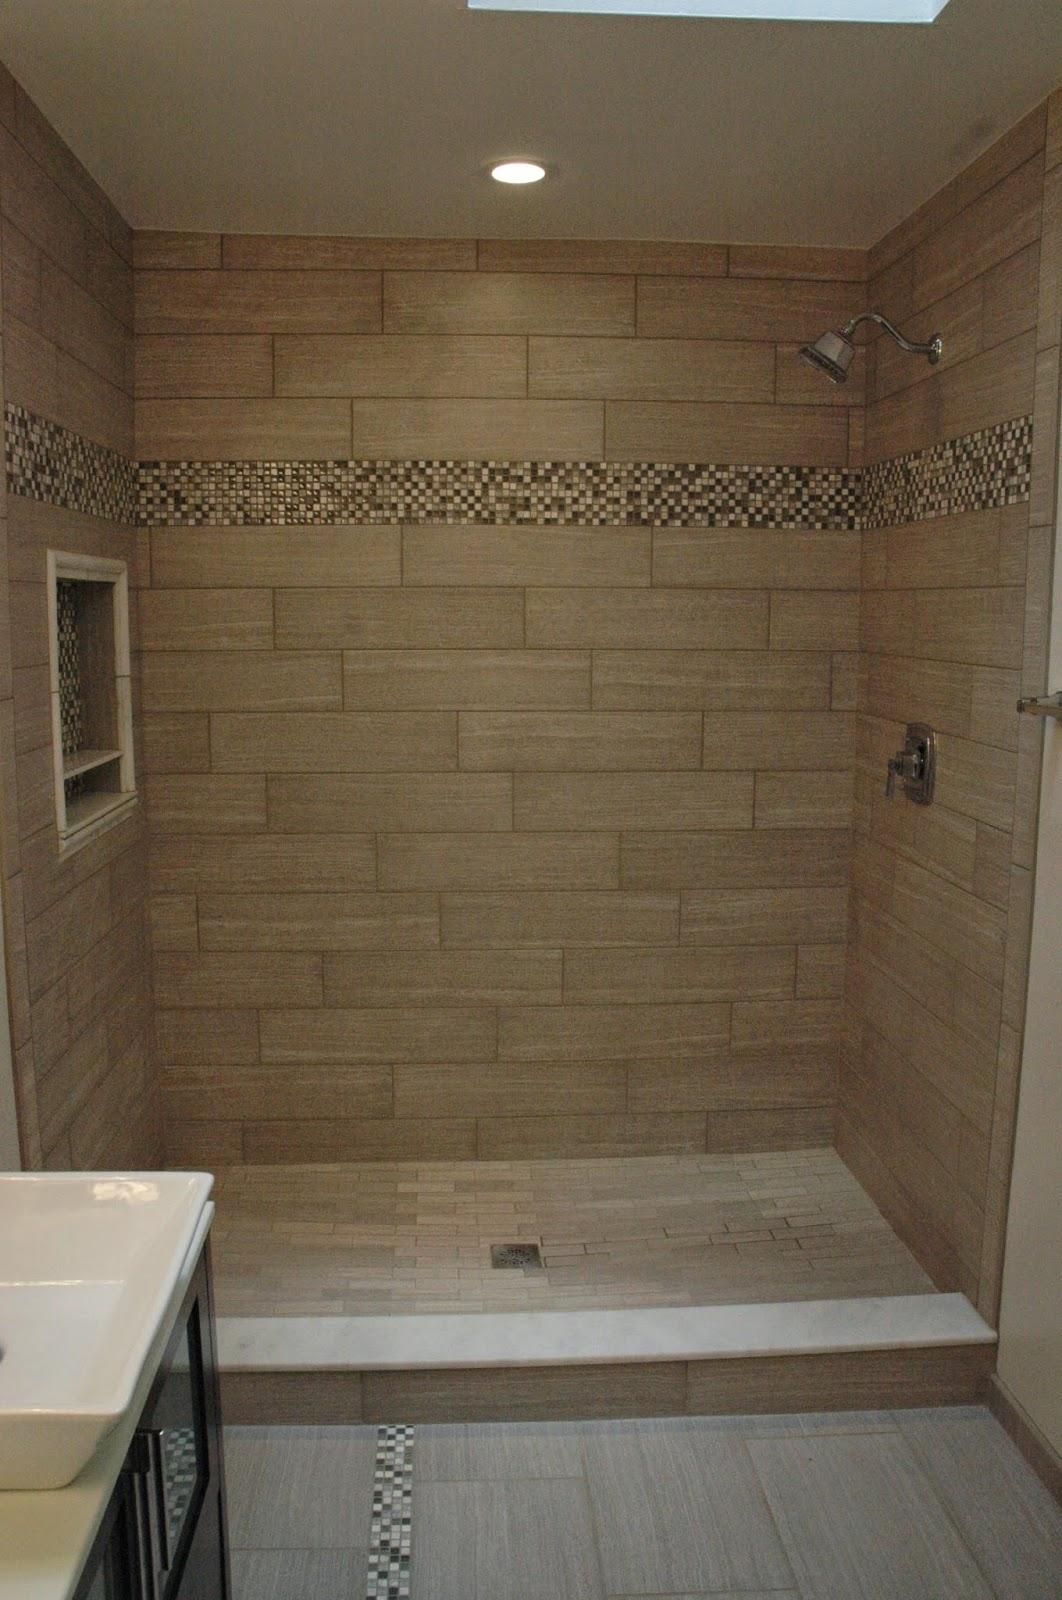 12x24 Tile Installation Custom Tile Showers, Bathroom Design, Renovations & Flooring